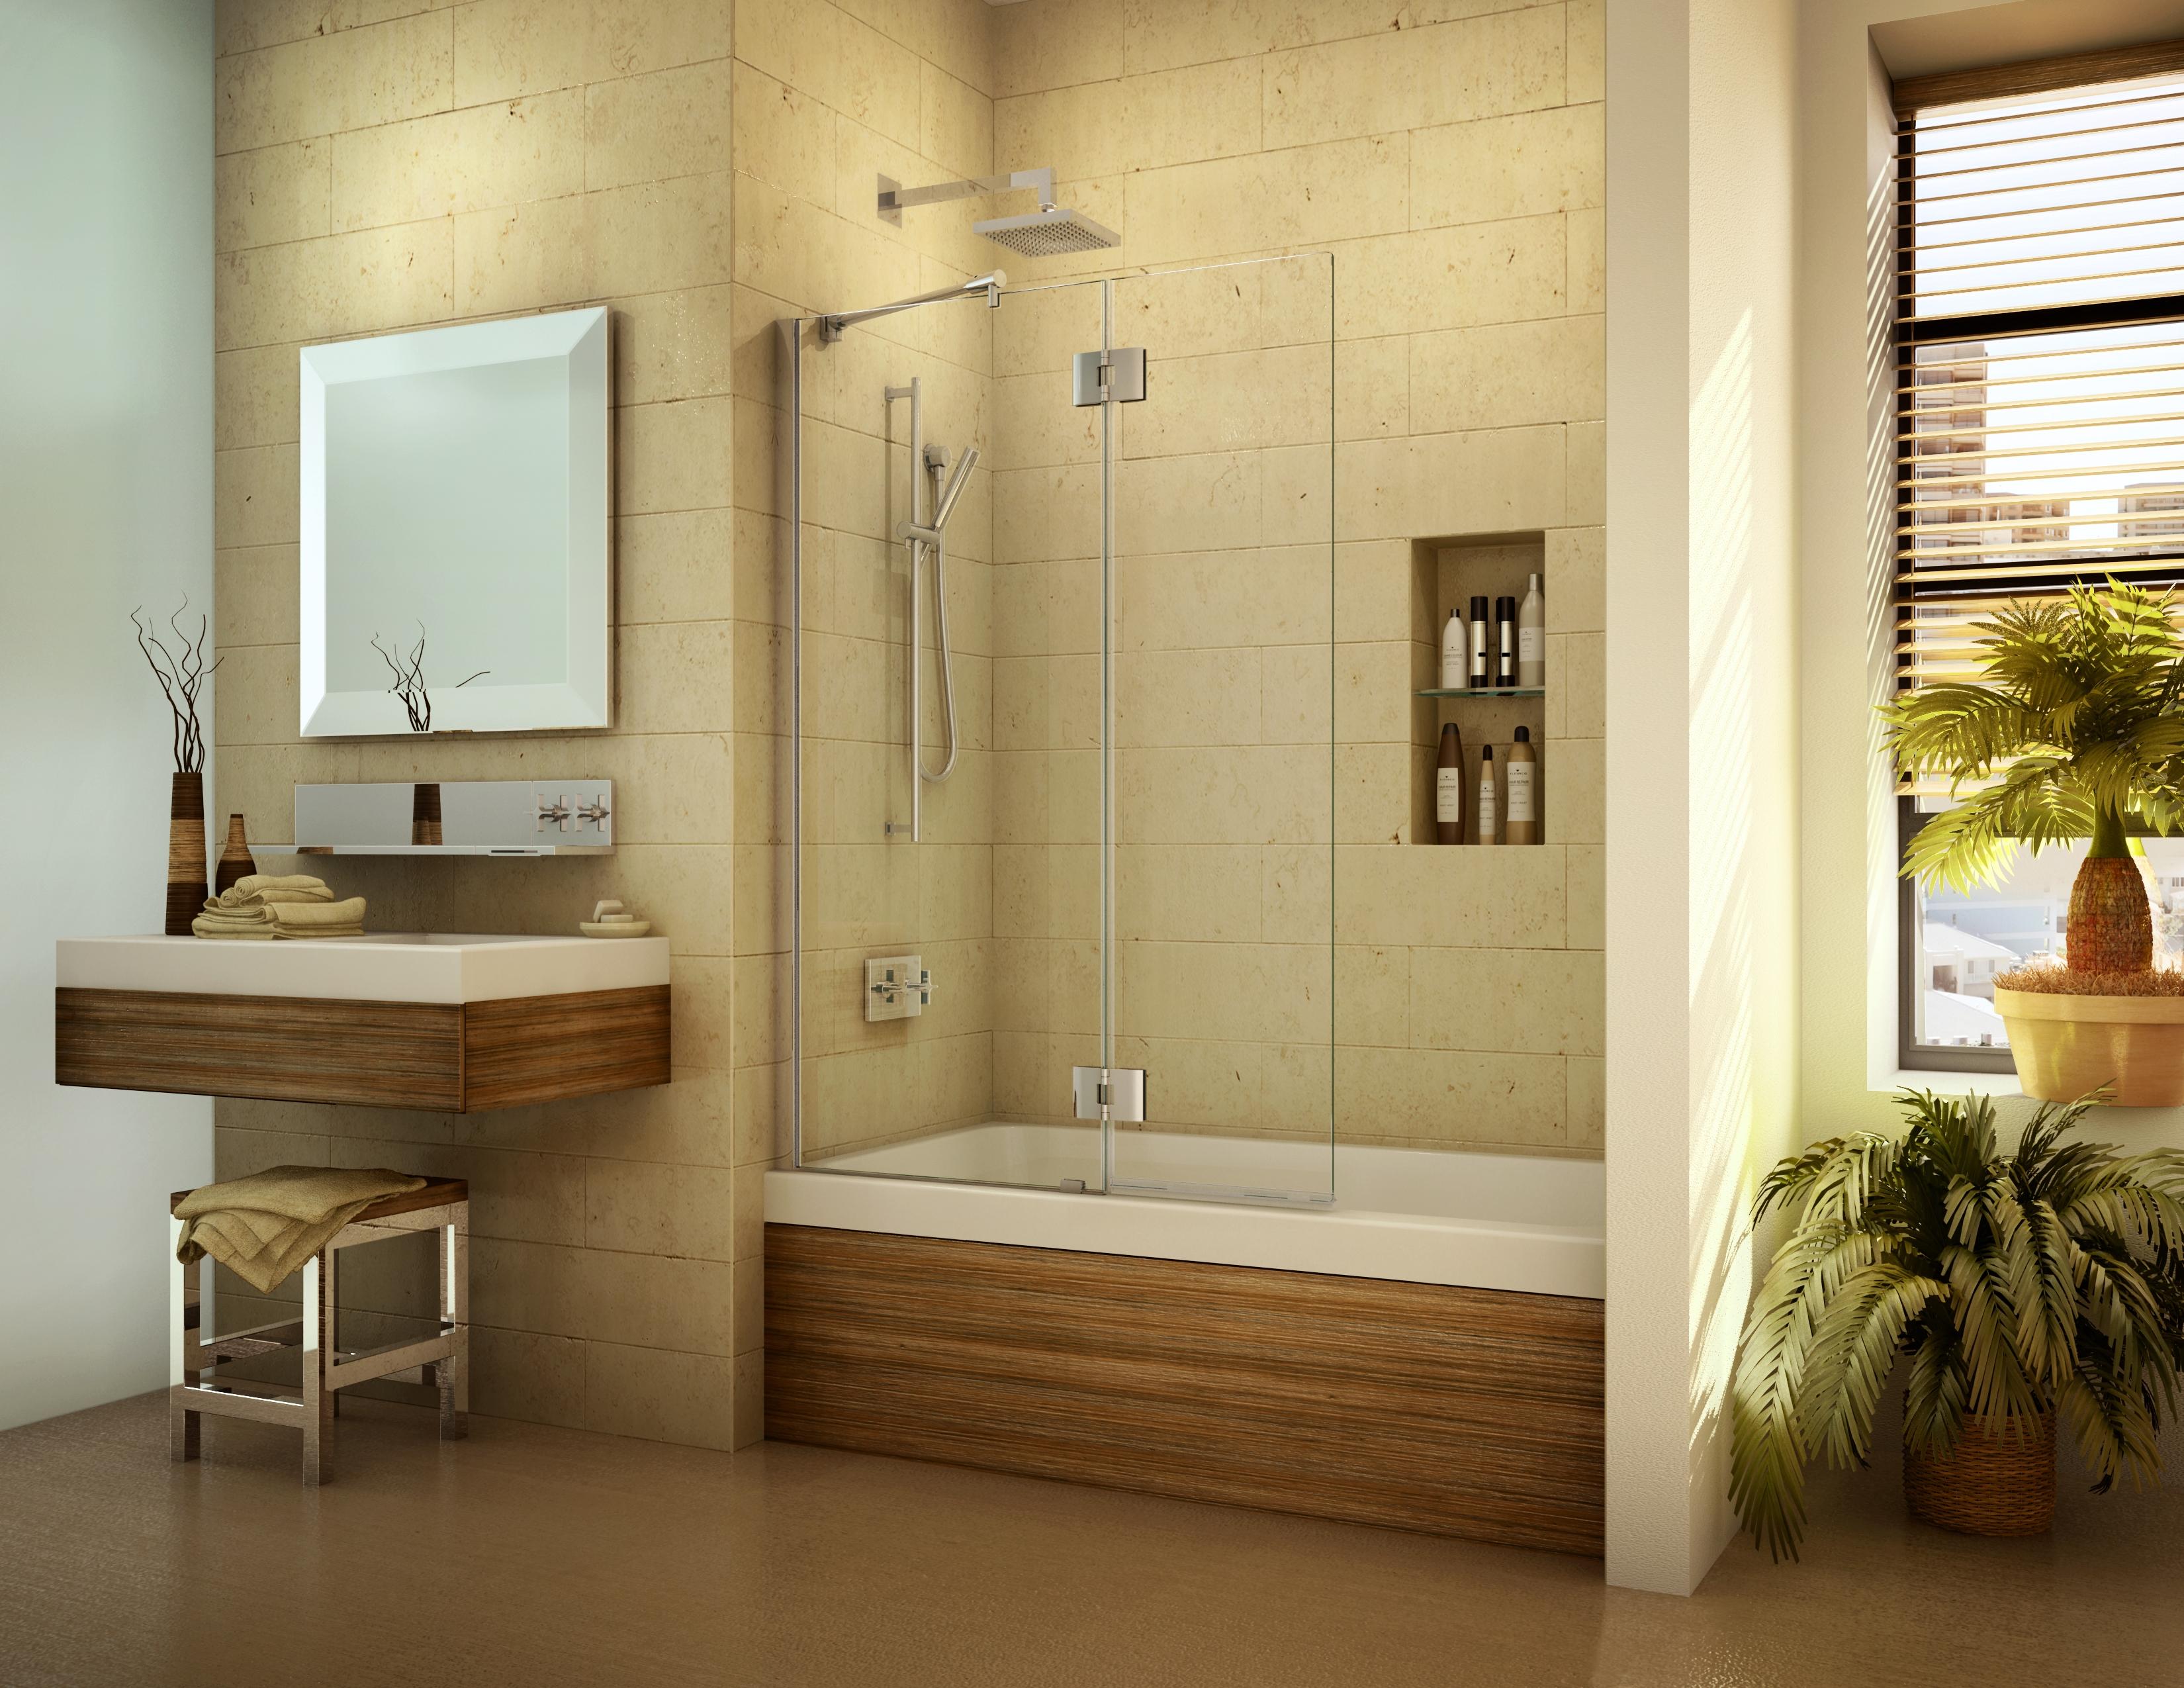 Frameless bath screen and tub shield door1 – Mia Shower Doors